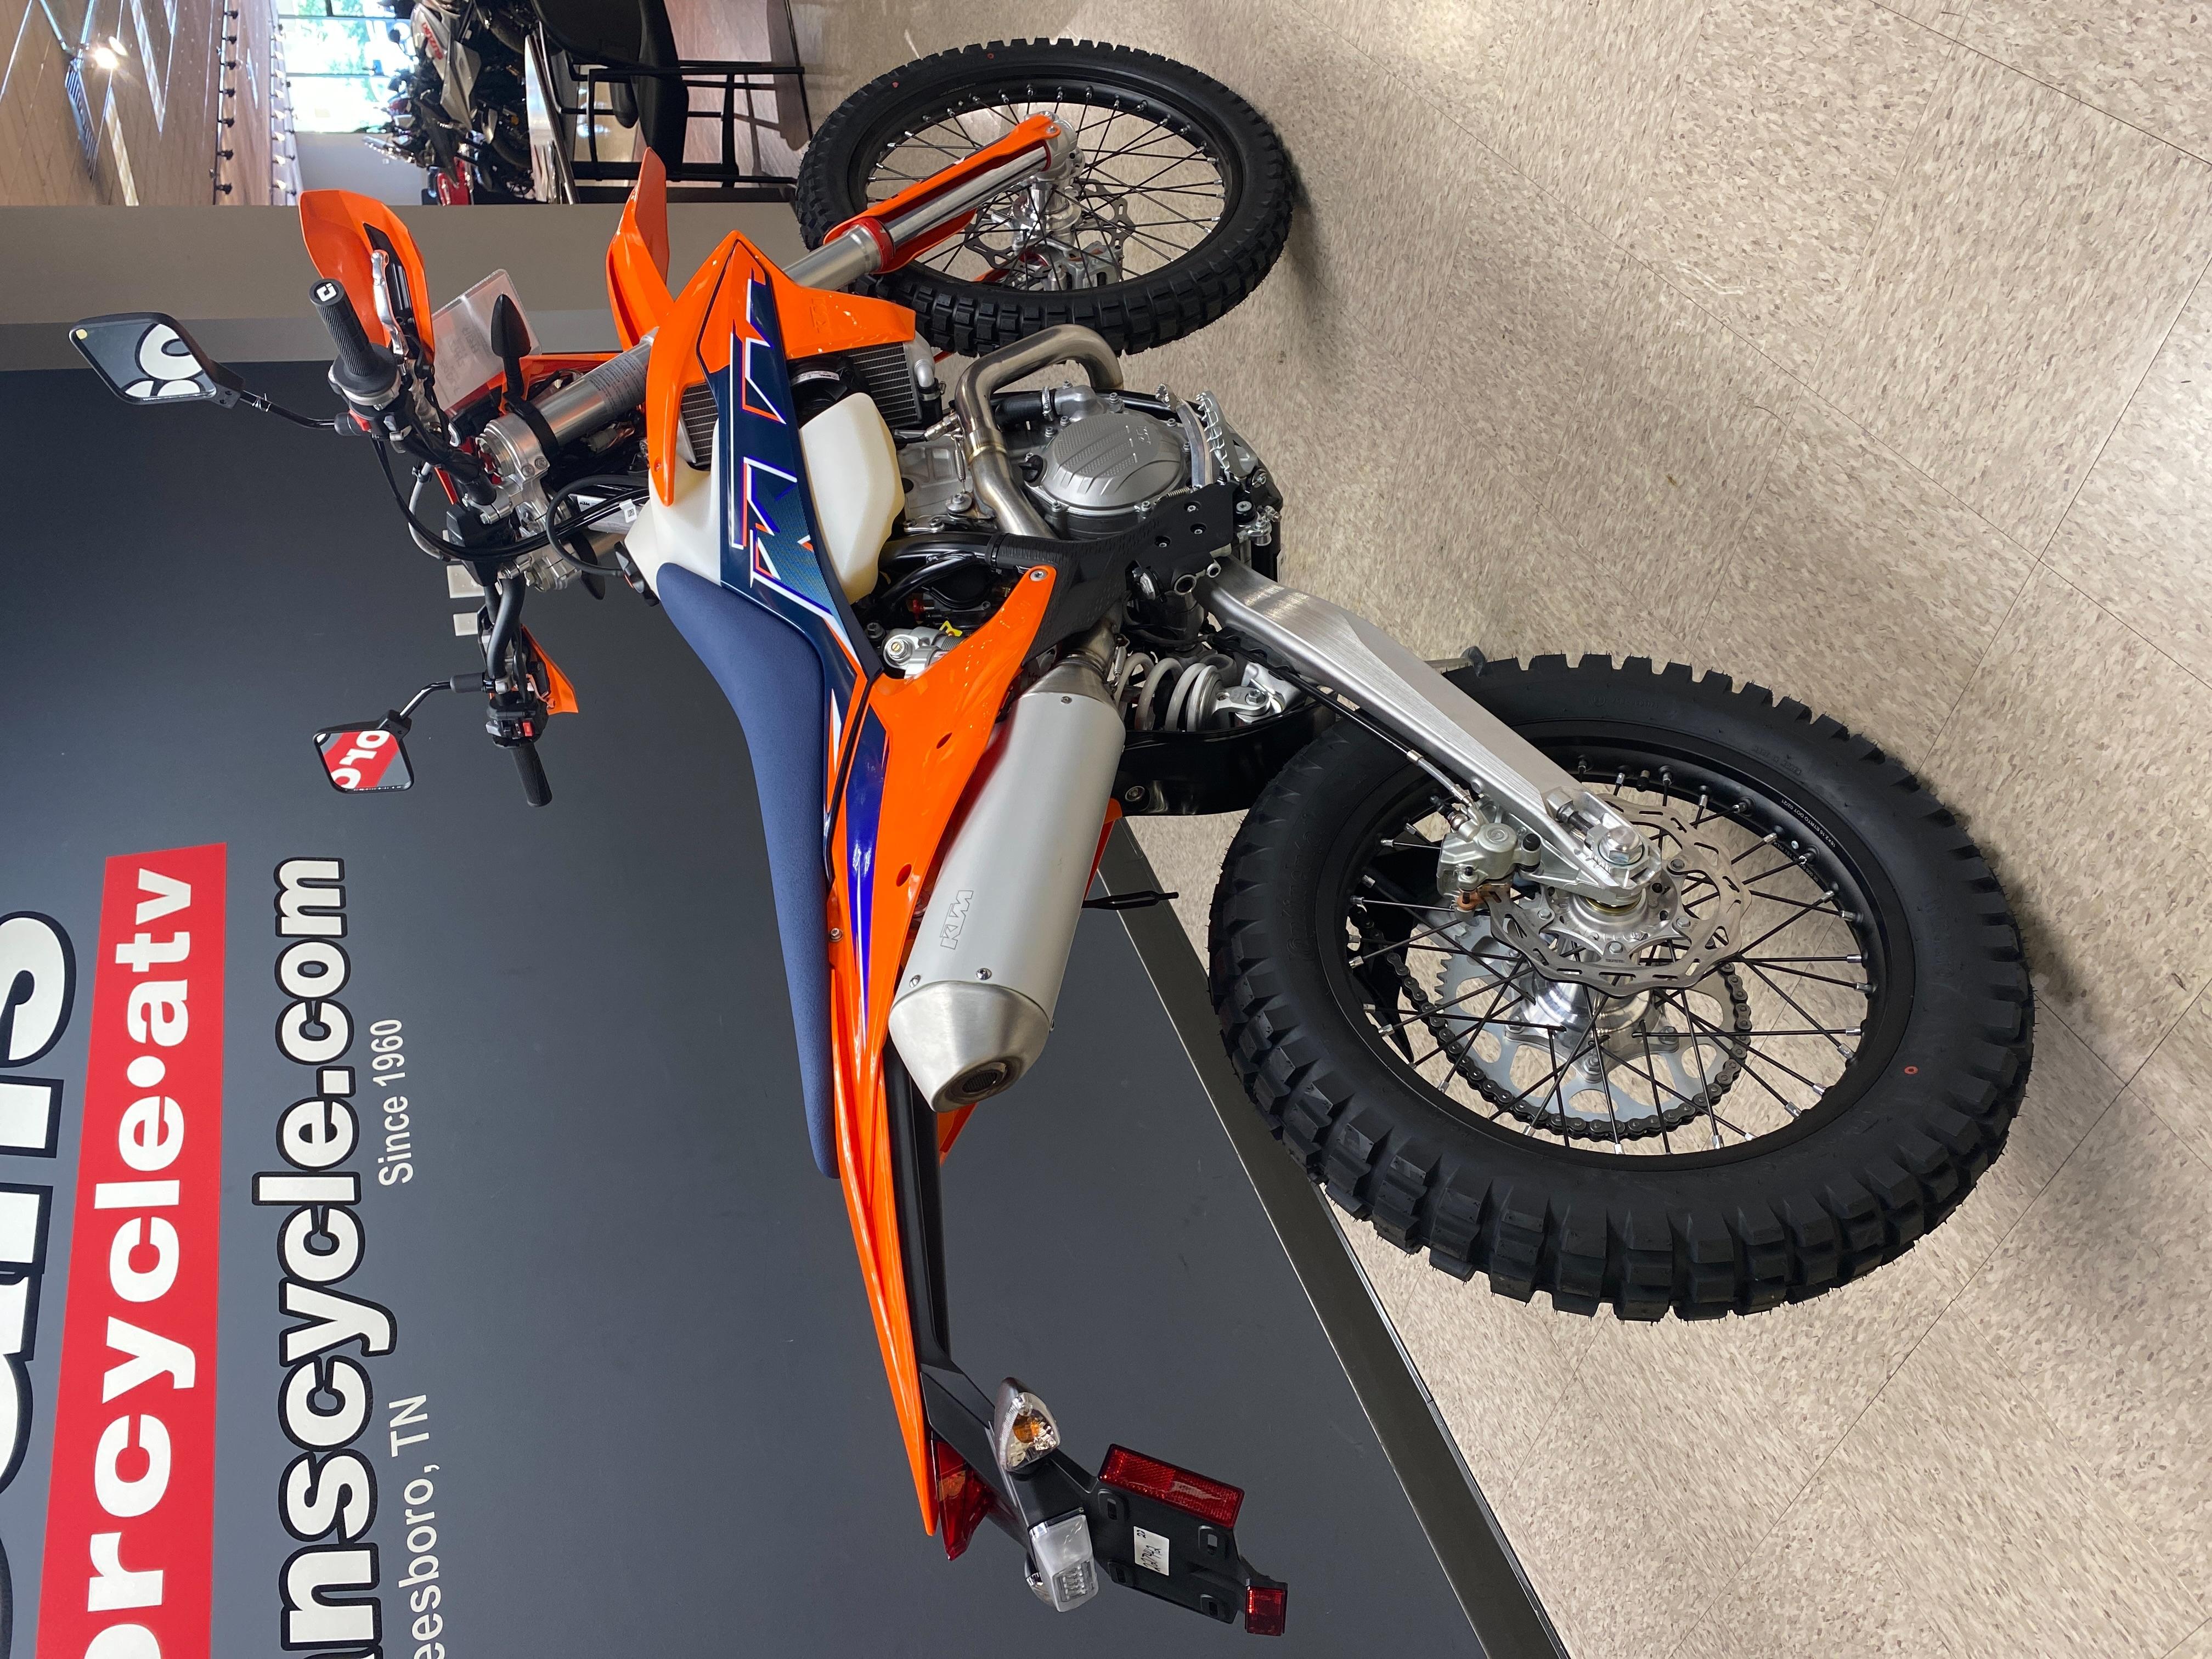 2022 KTM EXC 350 F at Sloans Motorcycle ATV, Murfreesboro, TN, 37129